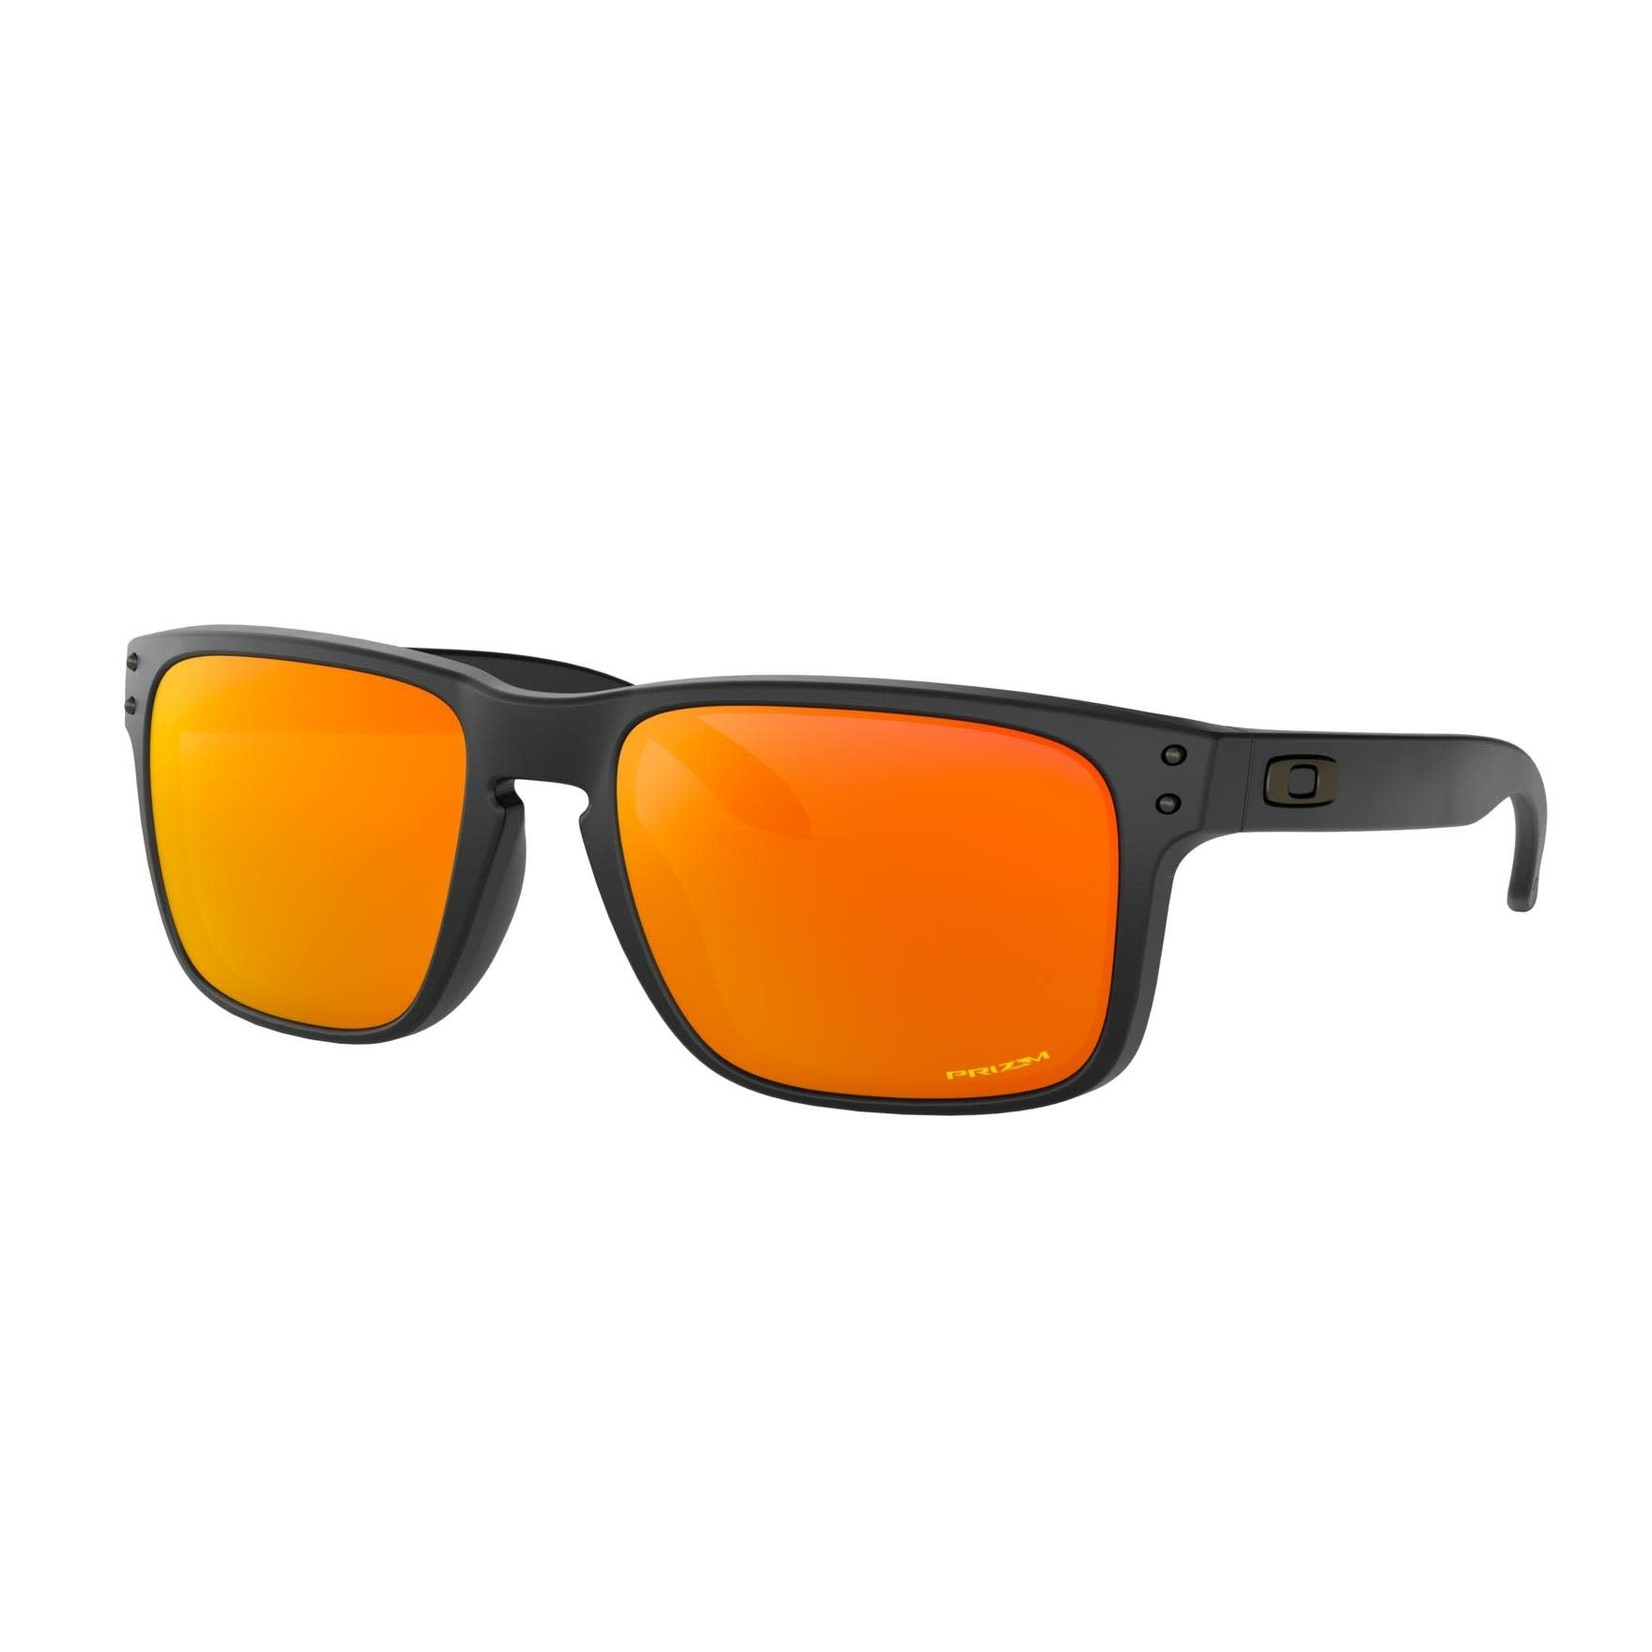 Oakley Oakley Sunglasses, Holbrook, Matte Blk, Prizm Ruby